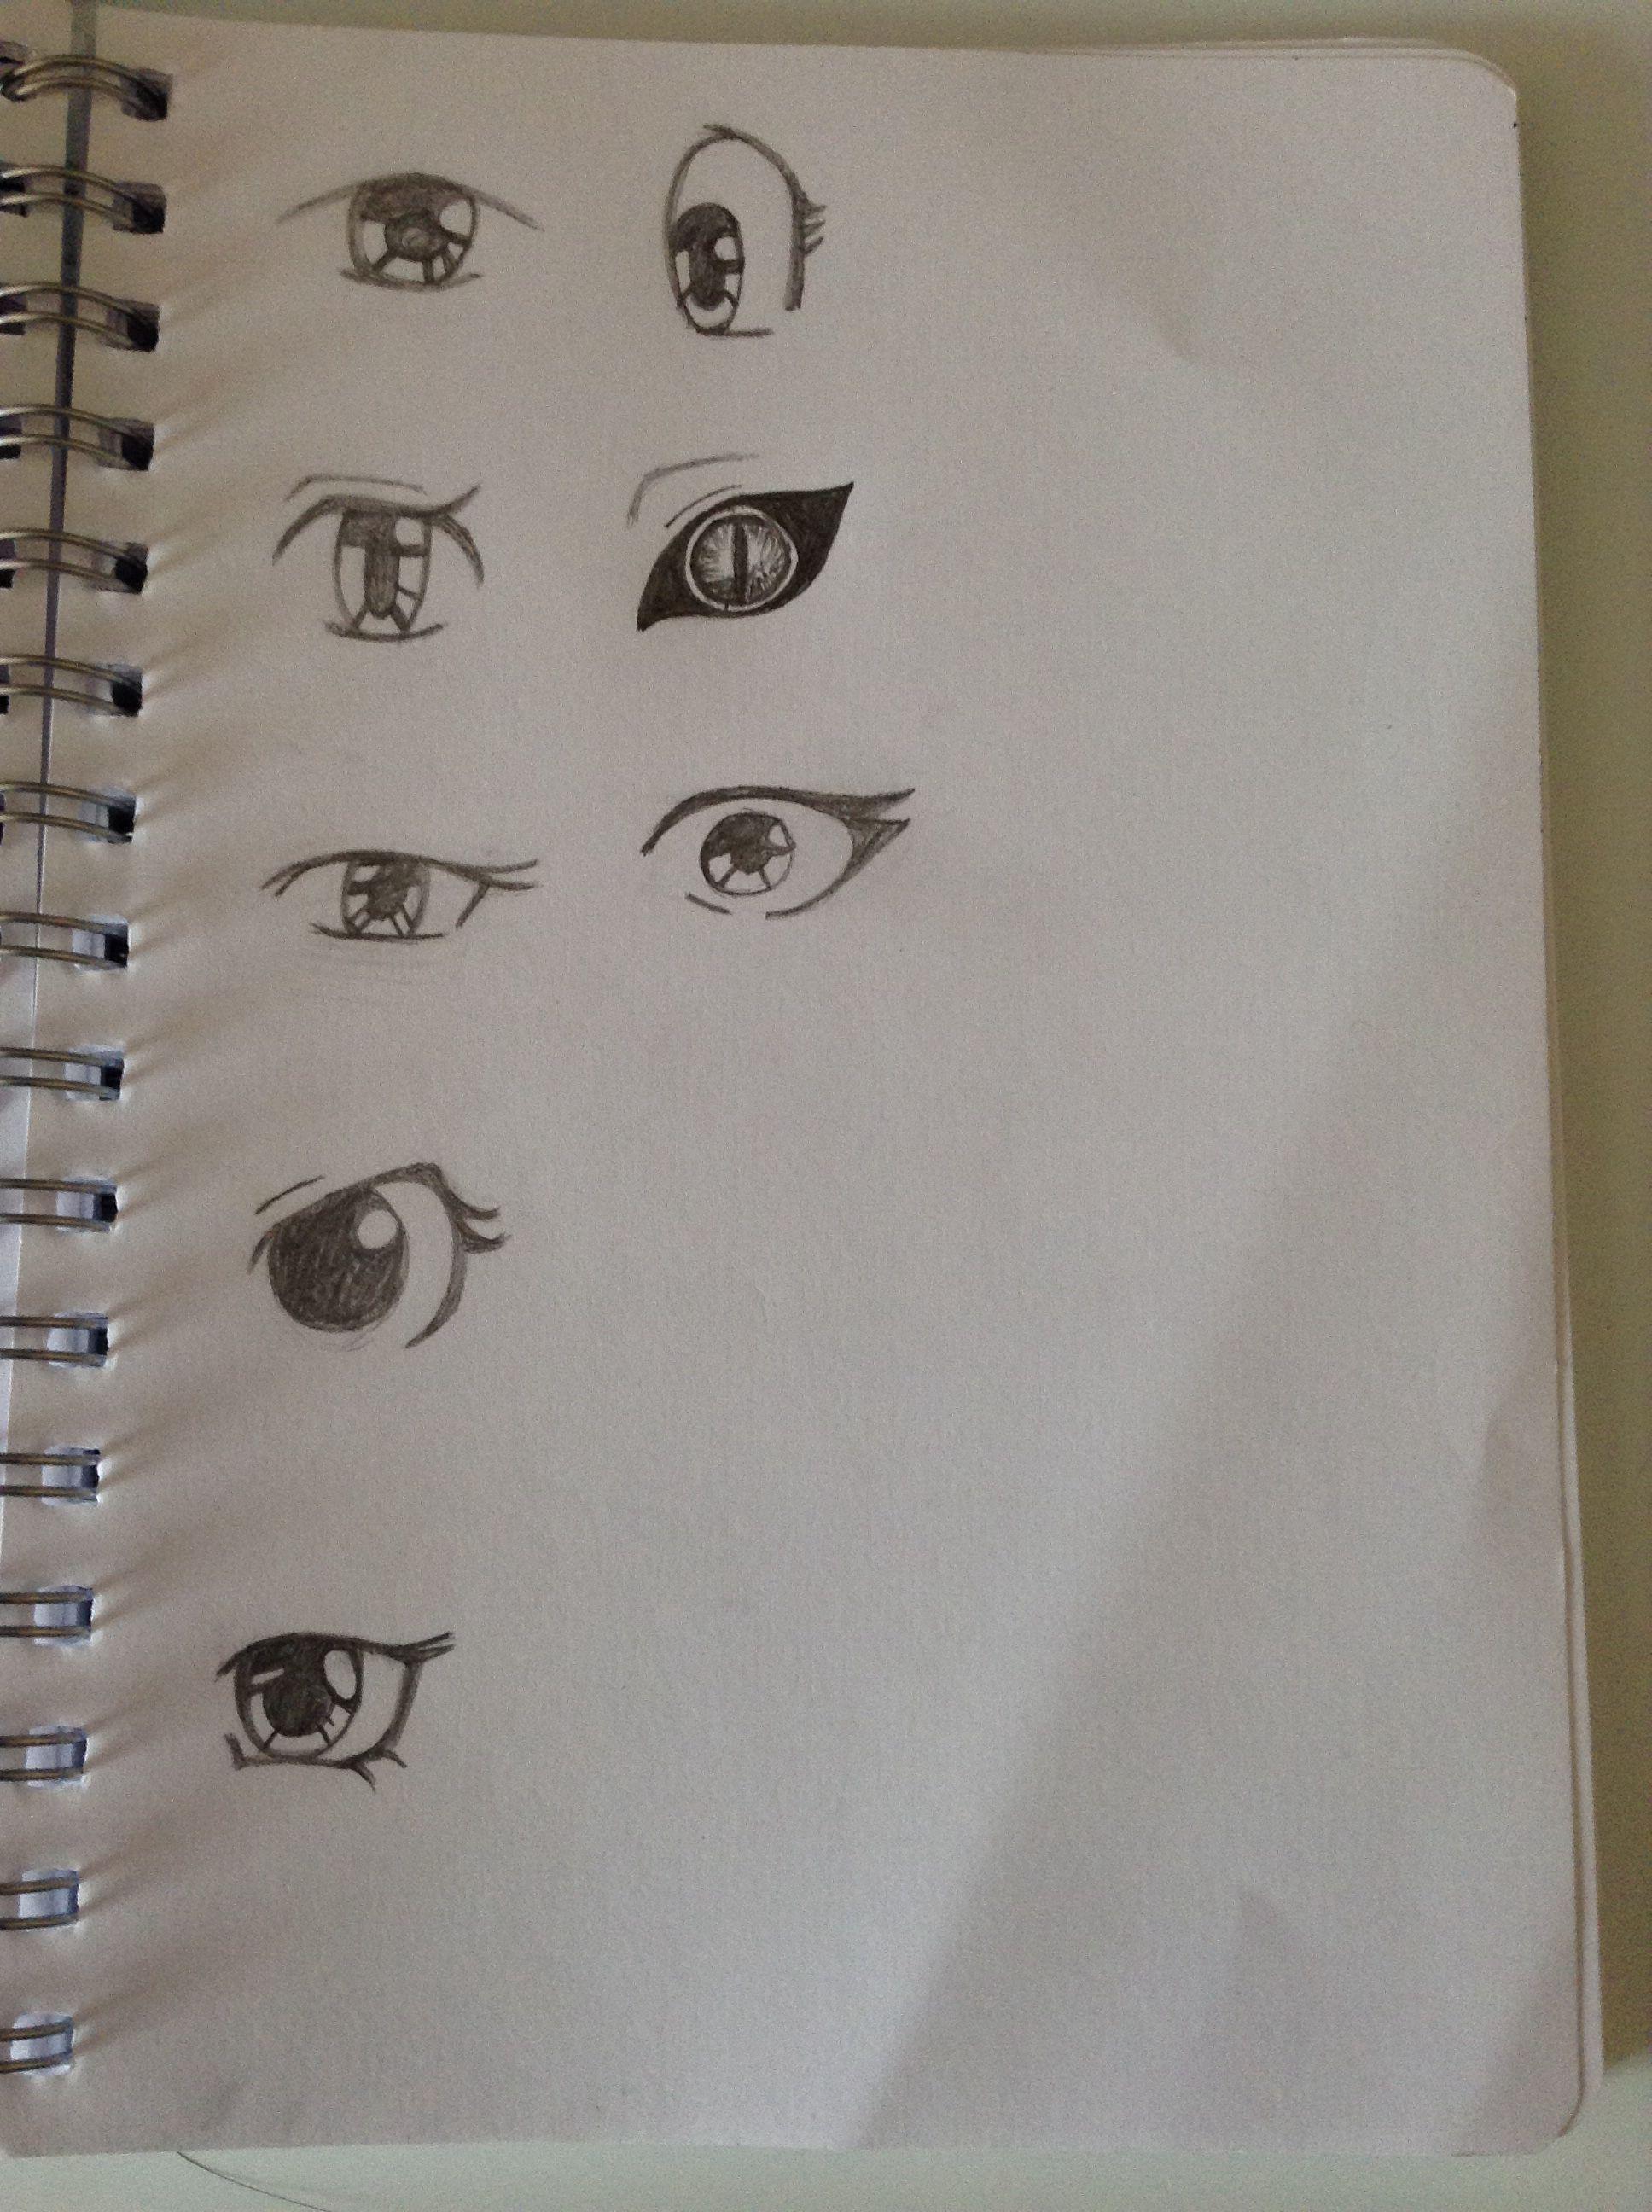 Anime eyes thinking of making my own manga character idk